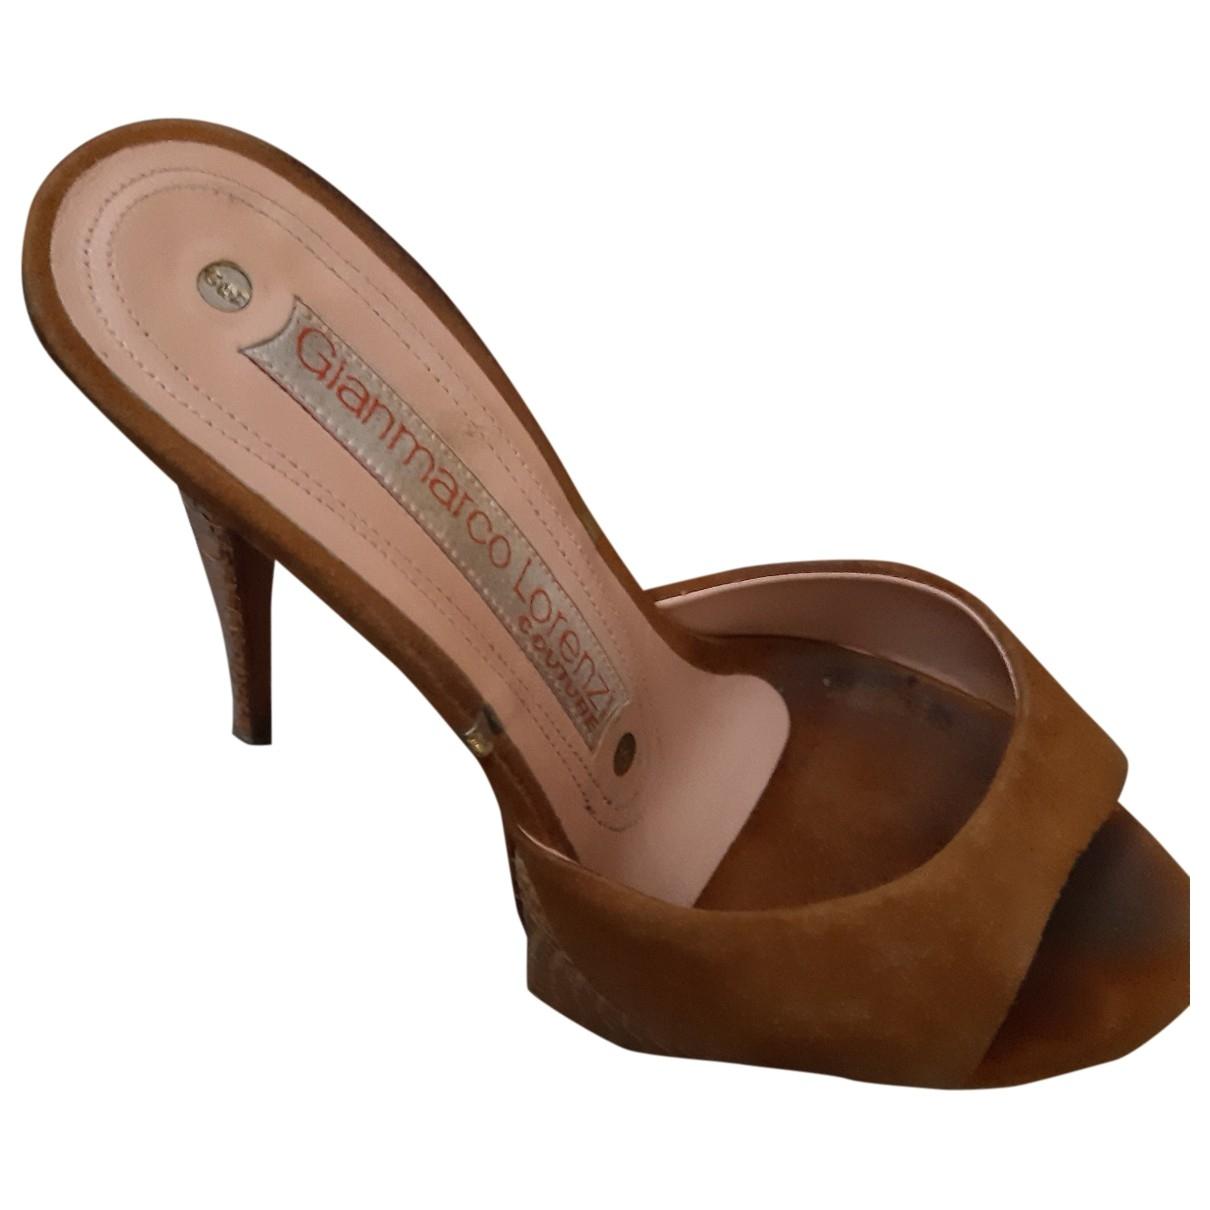 Gianmarco Lorenzi - Escarpins   pour femme en cuir - marron